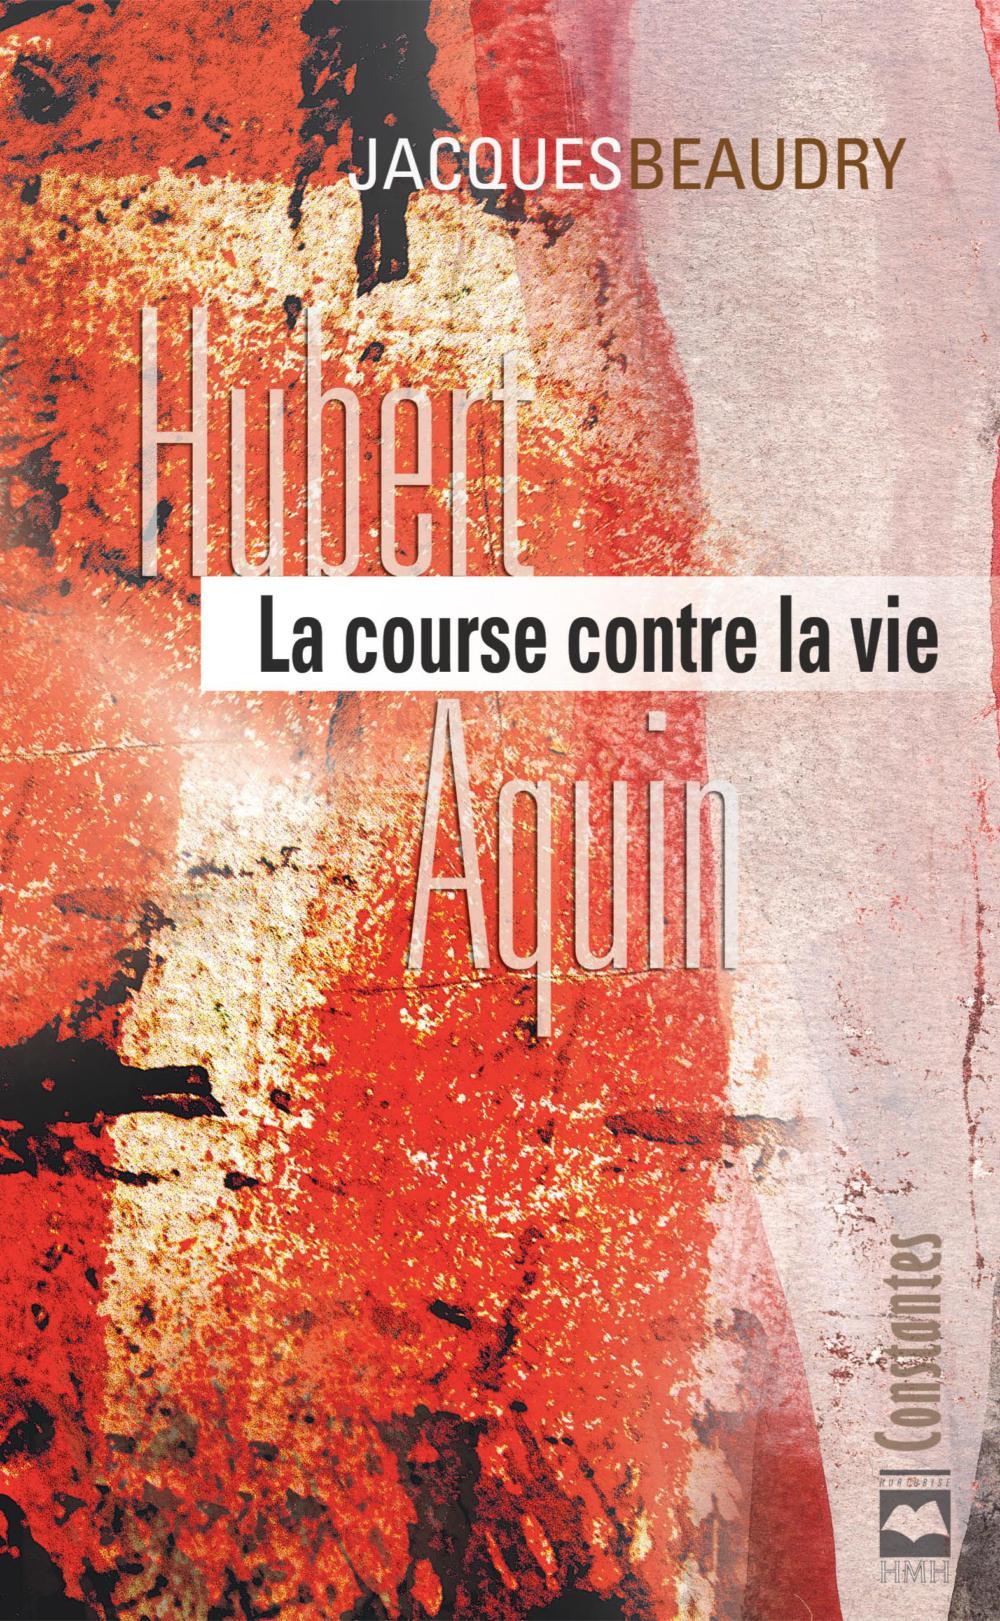 Hubert Aquin: La course contre la vie